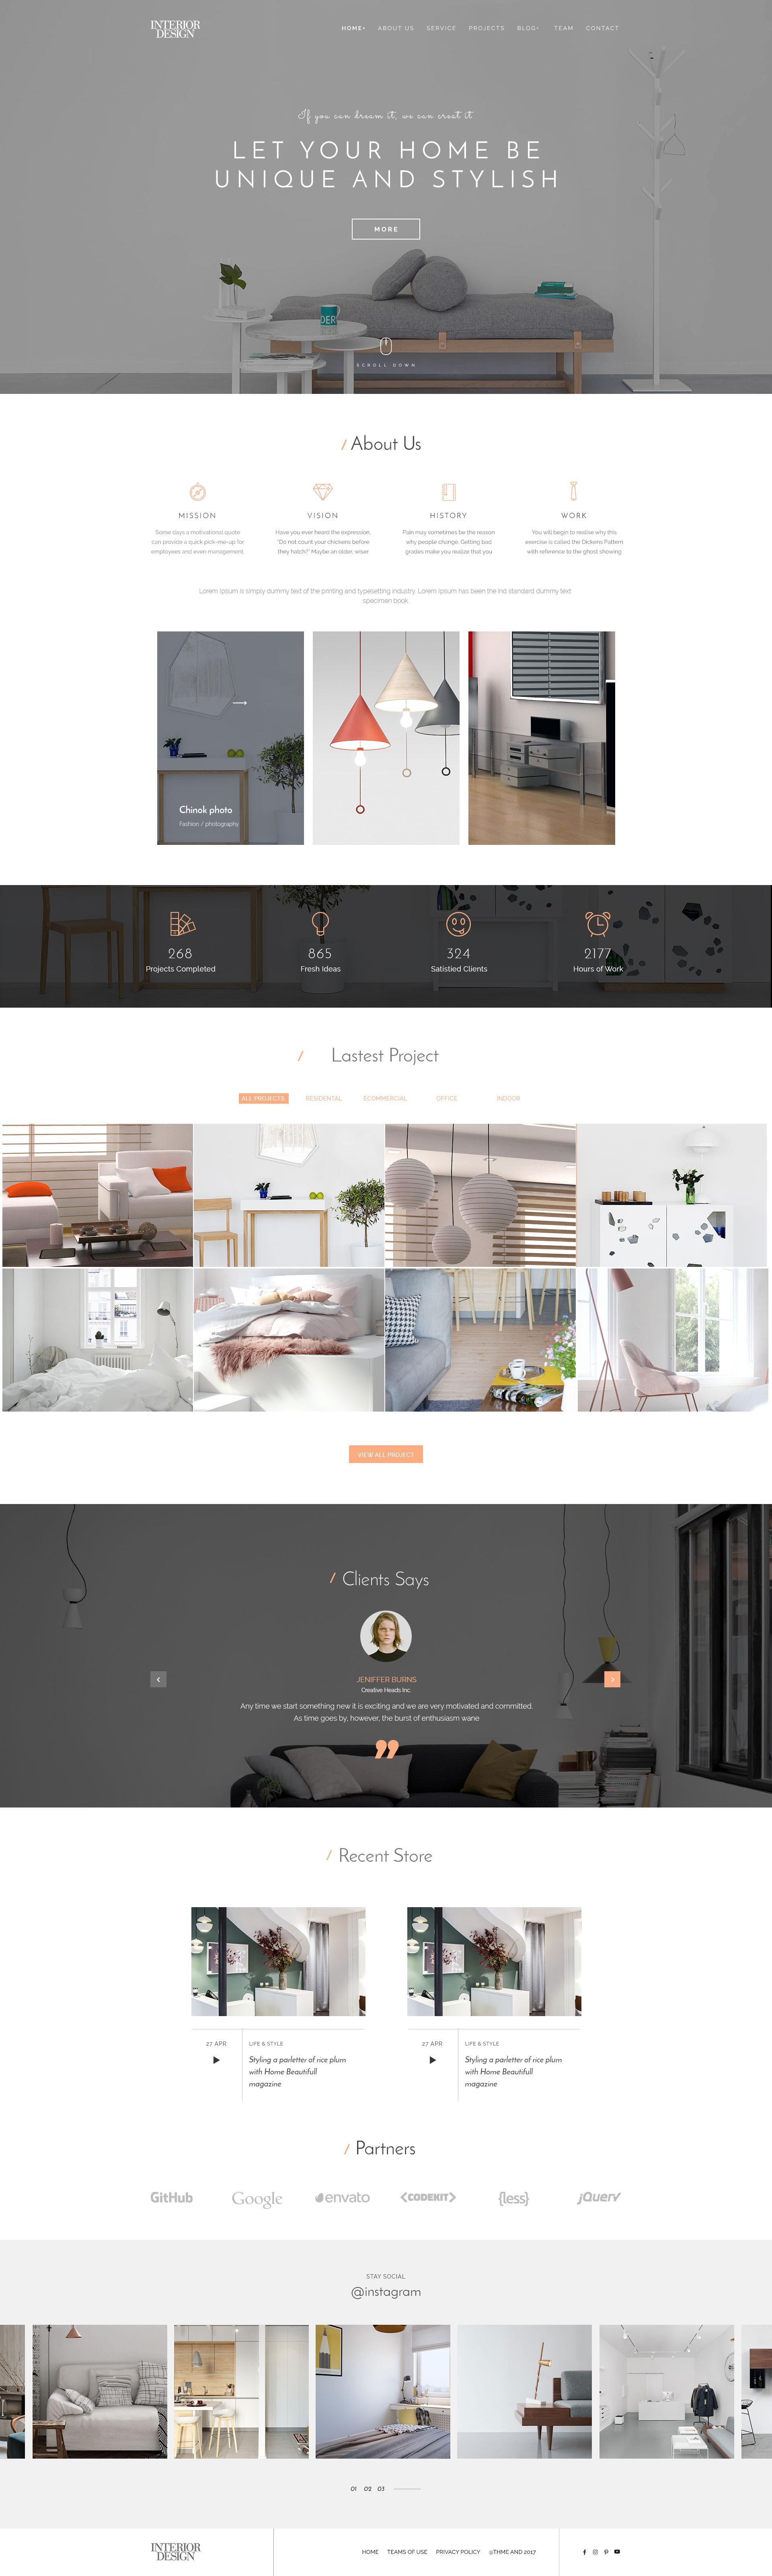 Interior Design - HTML5 Template for Interior Designer - 1